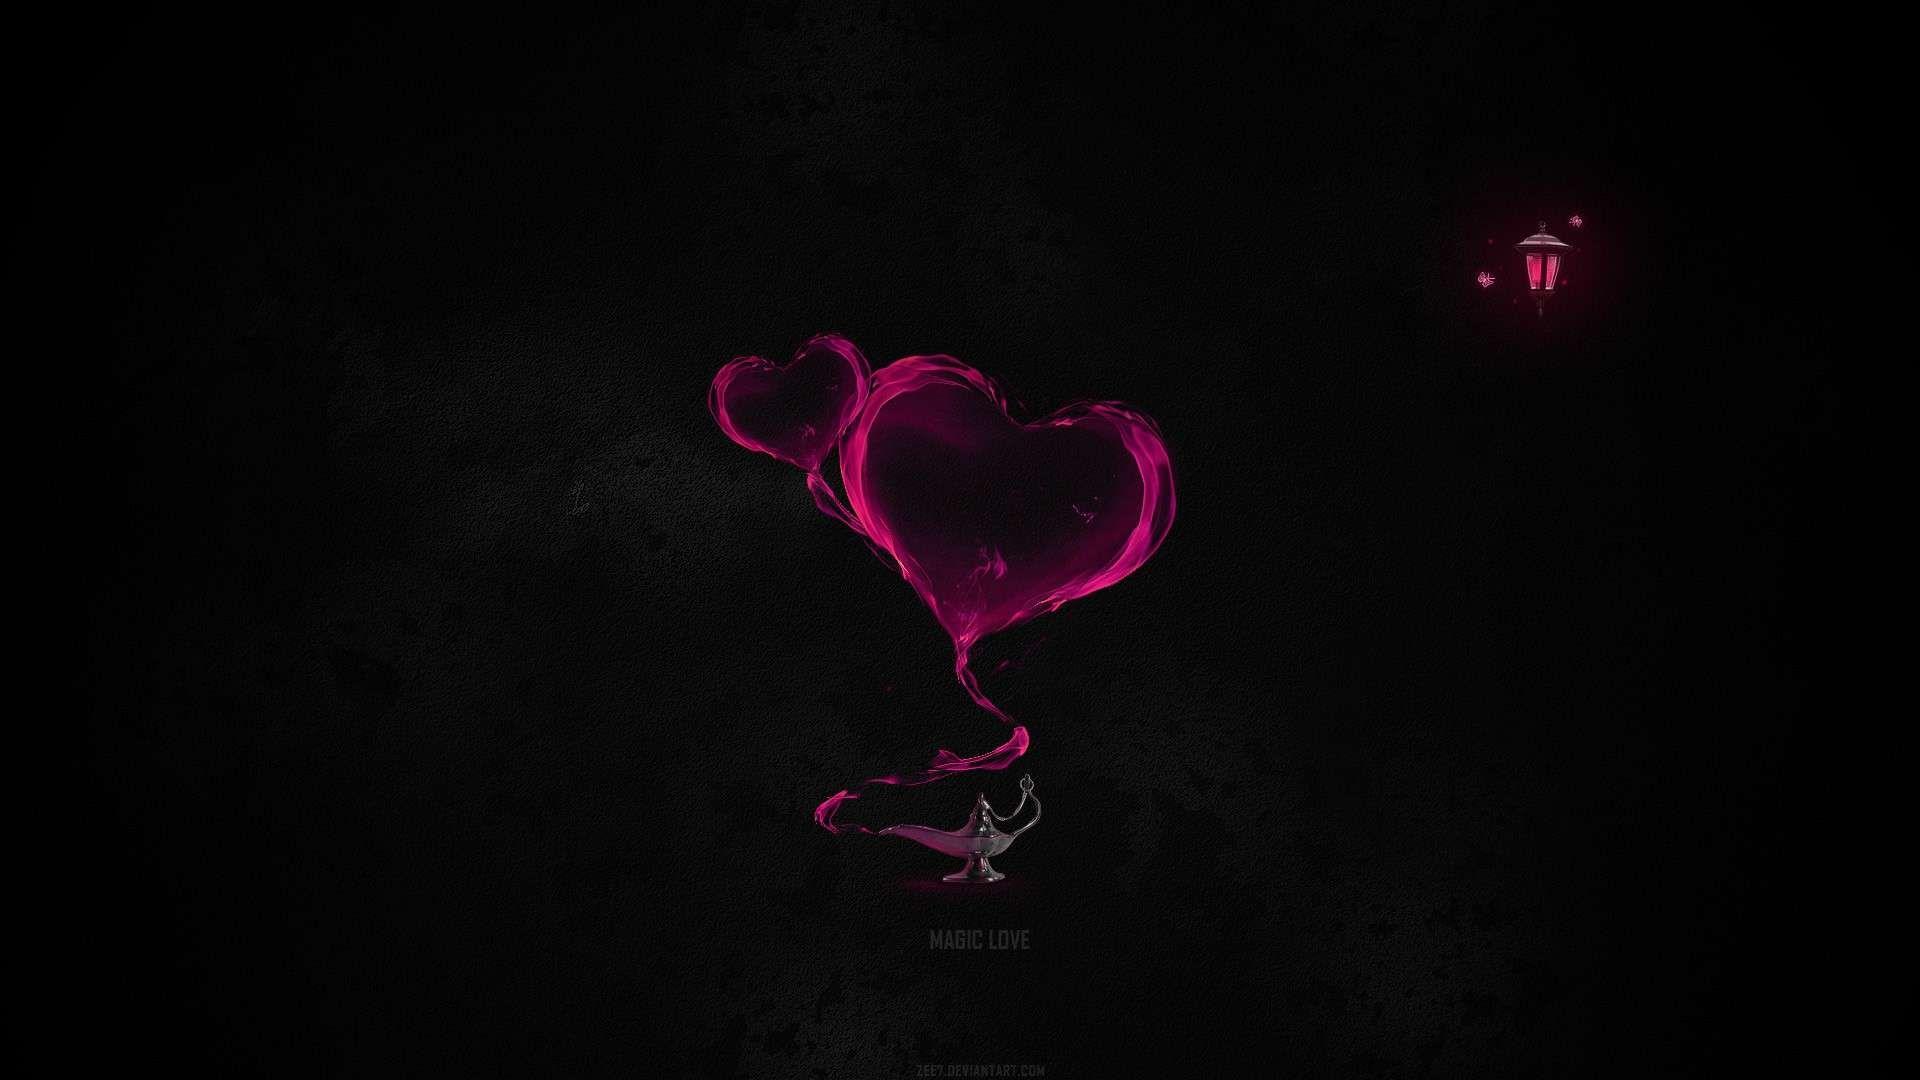 3 D Heart On Black Background